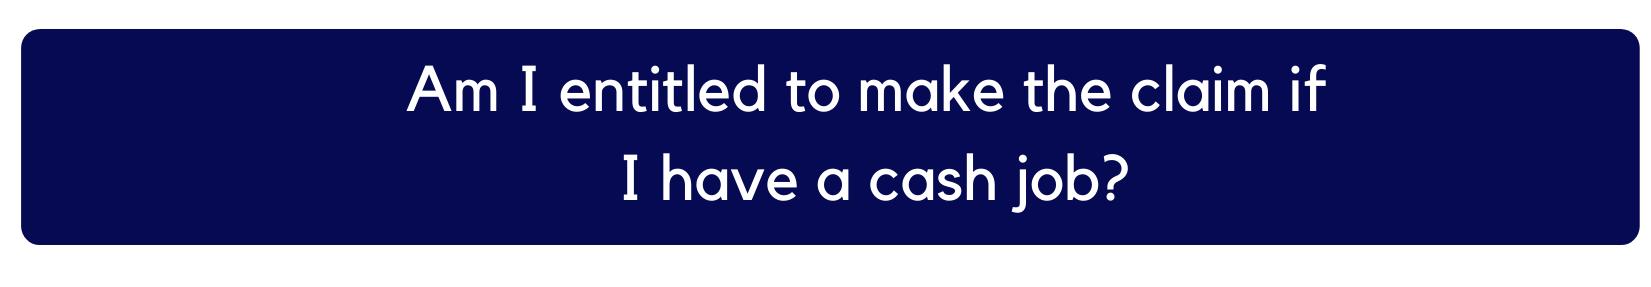 Am i entitled to make the claim if i have a cash job?